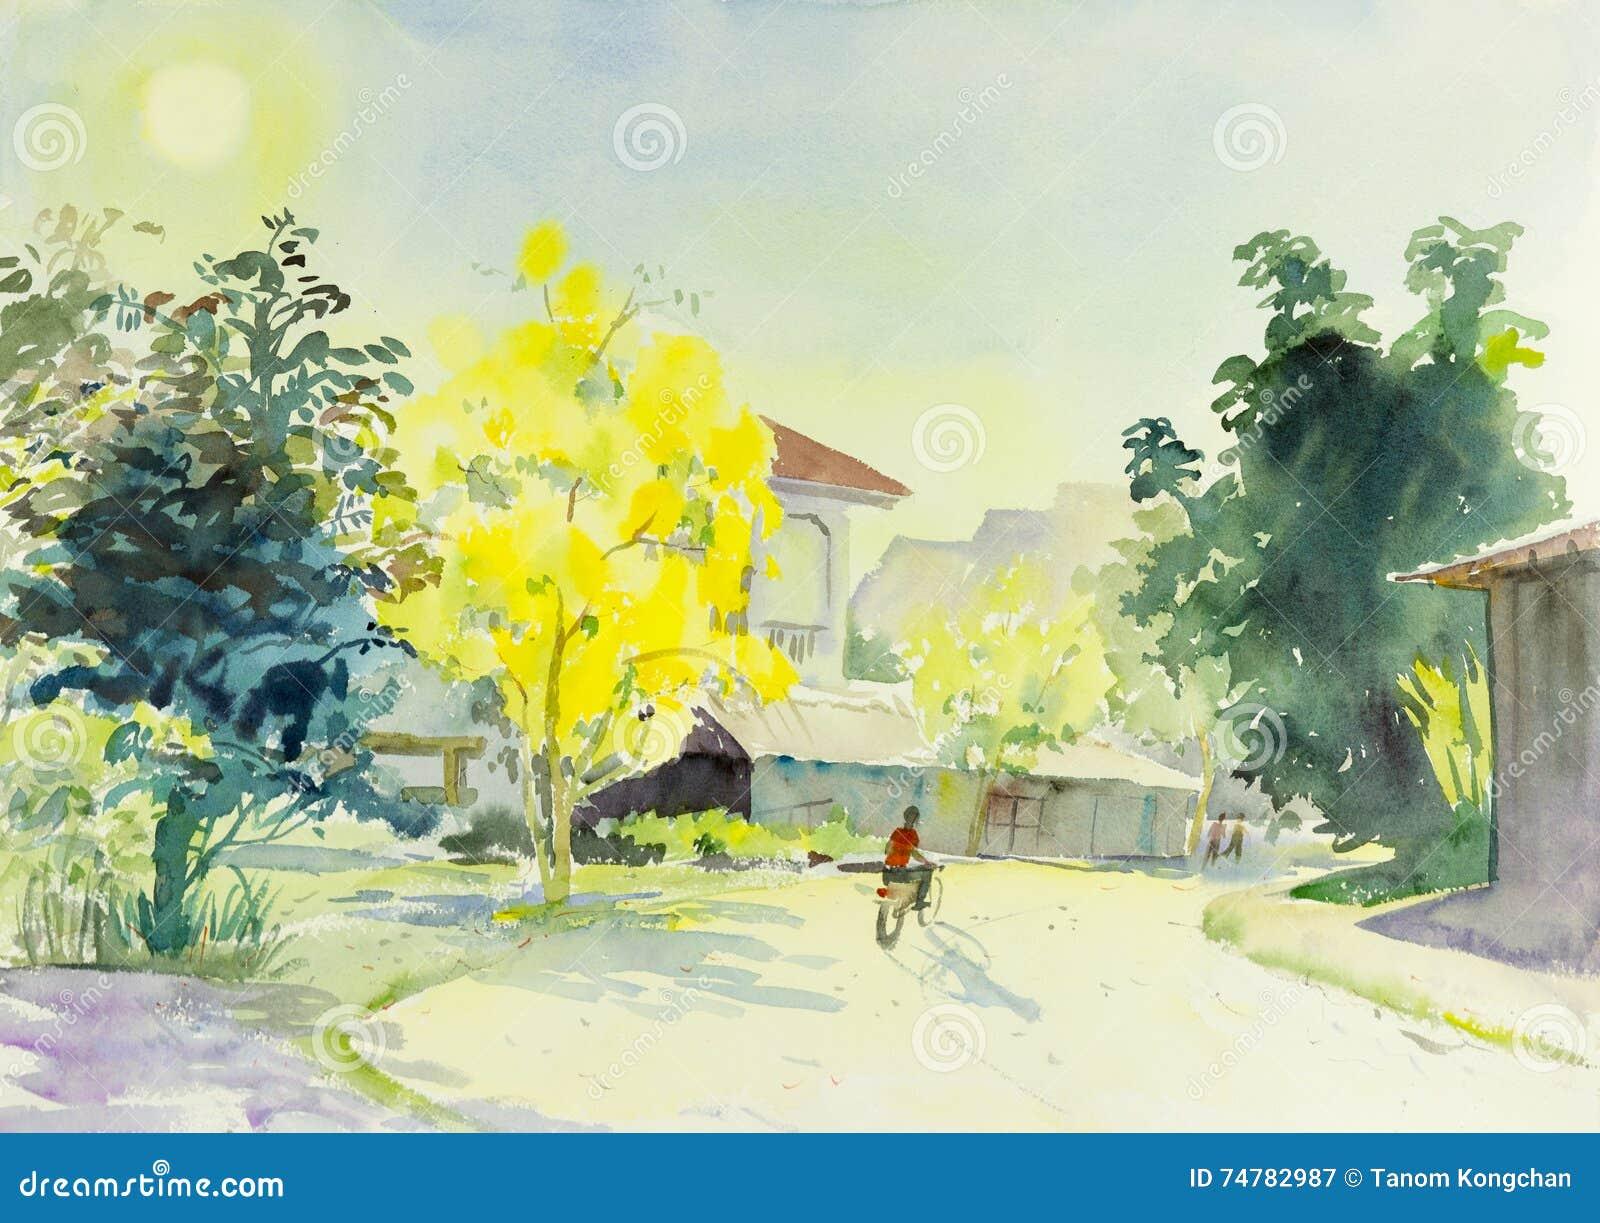 Landscape Original Colorful Of Golden Flower Tree And Emotion Stock ...